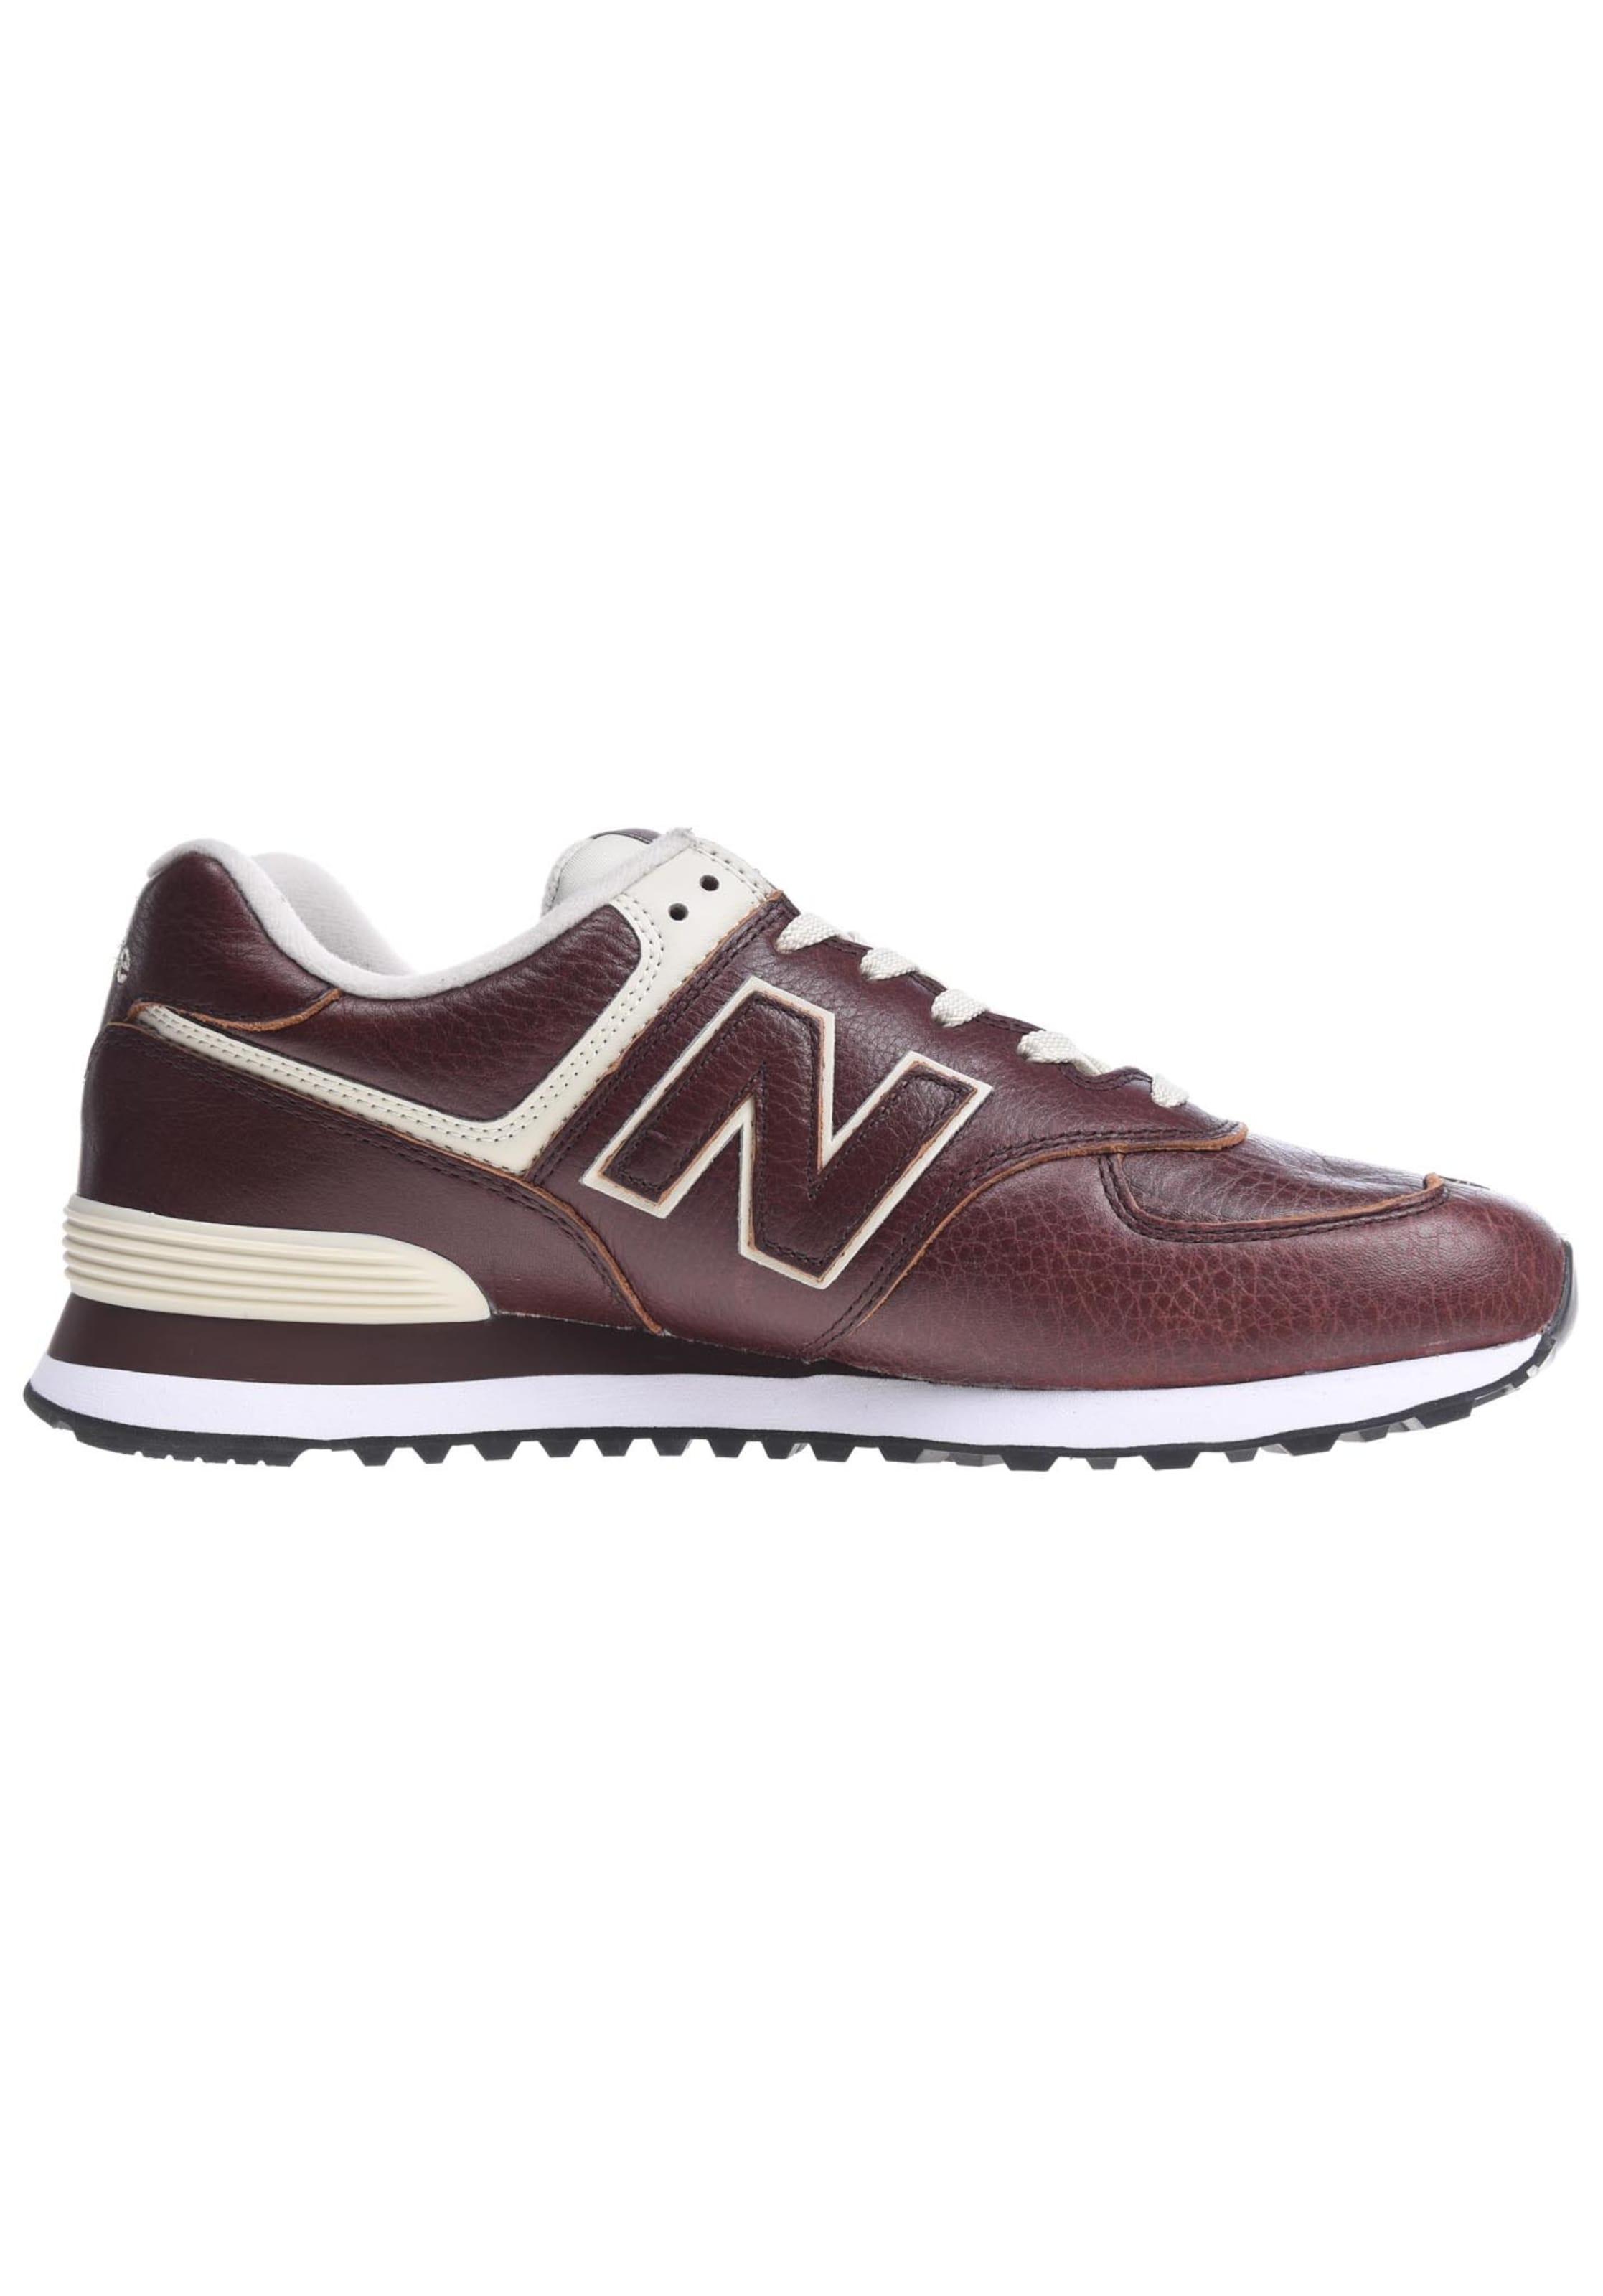 In Weiß D' HellbraunWeinrot 'ml574 New Balance Sneaker drtxshQBC